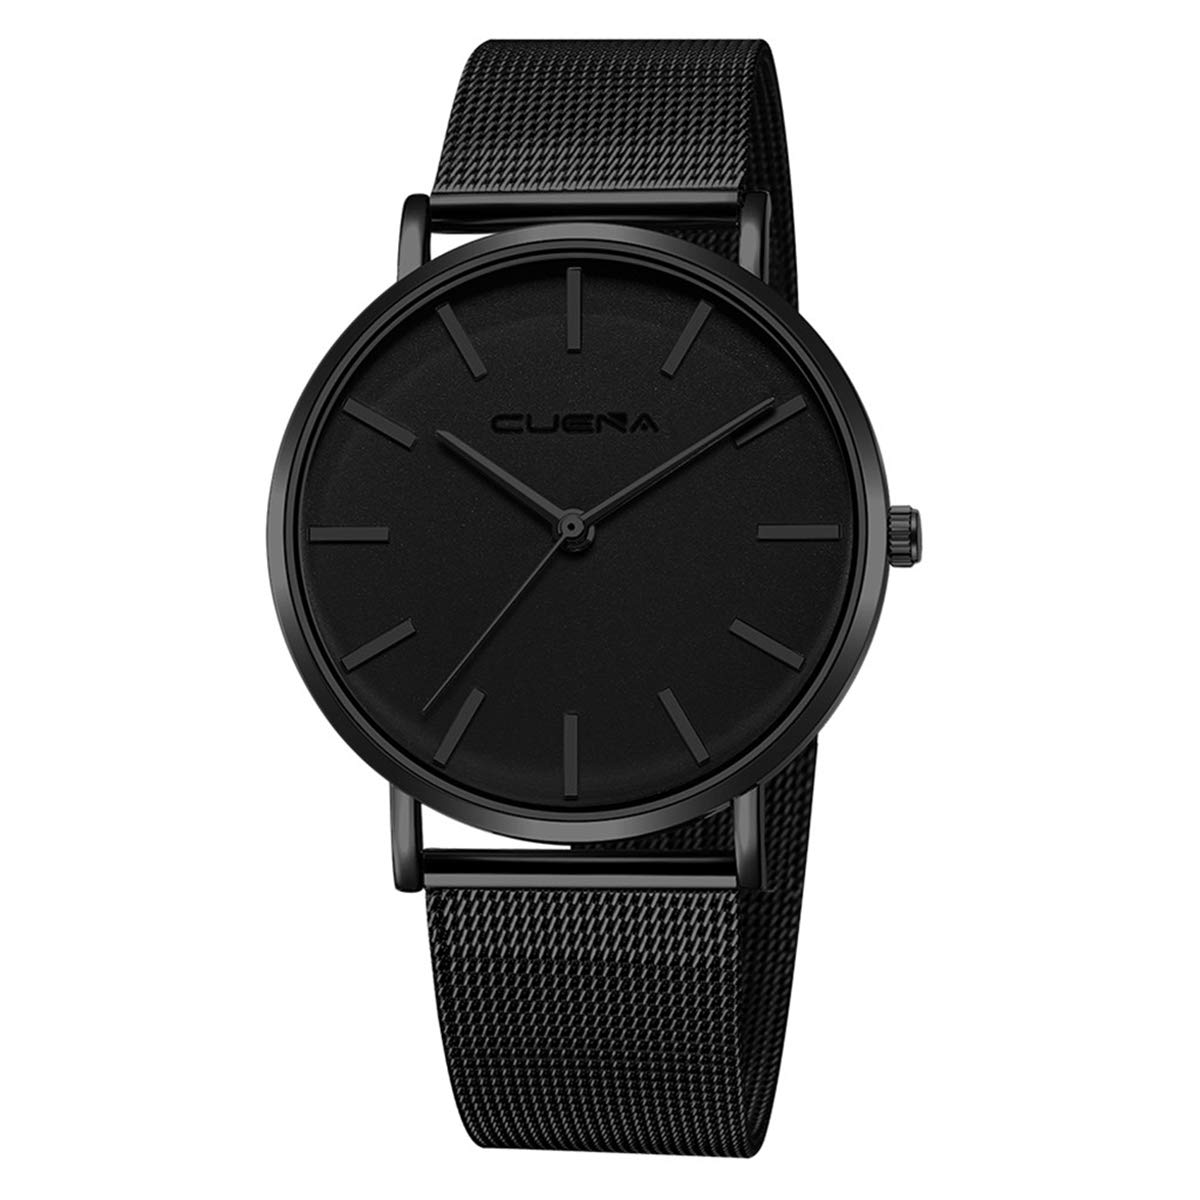 ZODRQ Men's Watch,Fashion Watches Stainless Steel Mesh Wrist Watch Casual Wristwatch Quartz Watch for Men Gift (G) by ZODRQ